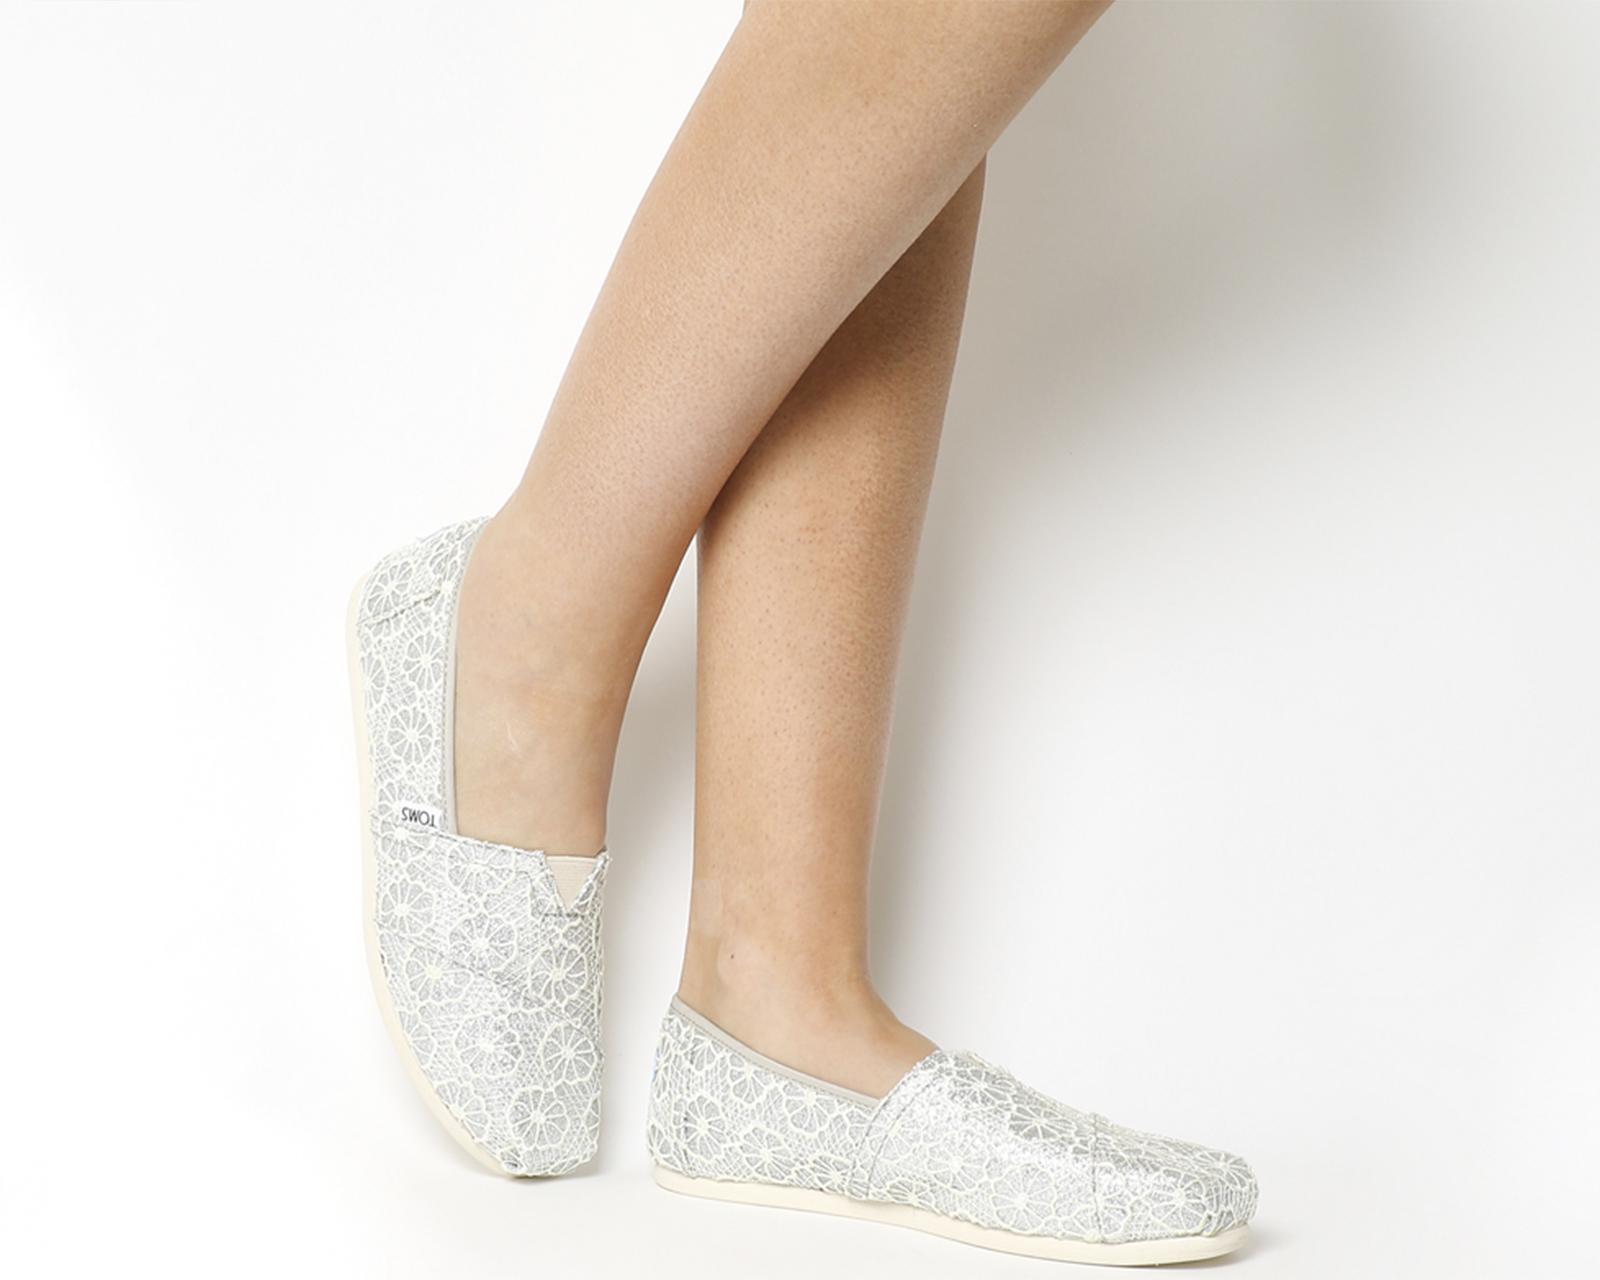 Toms Seasonal Classic Slip On Silver Crochet Glitter Flats